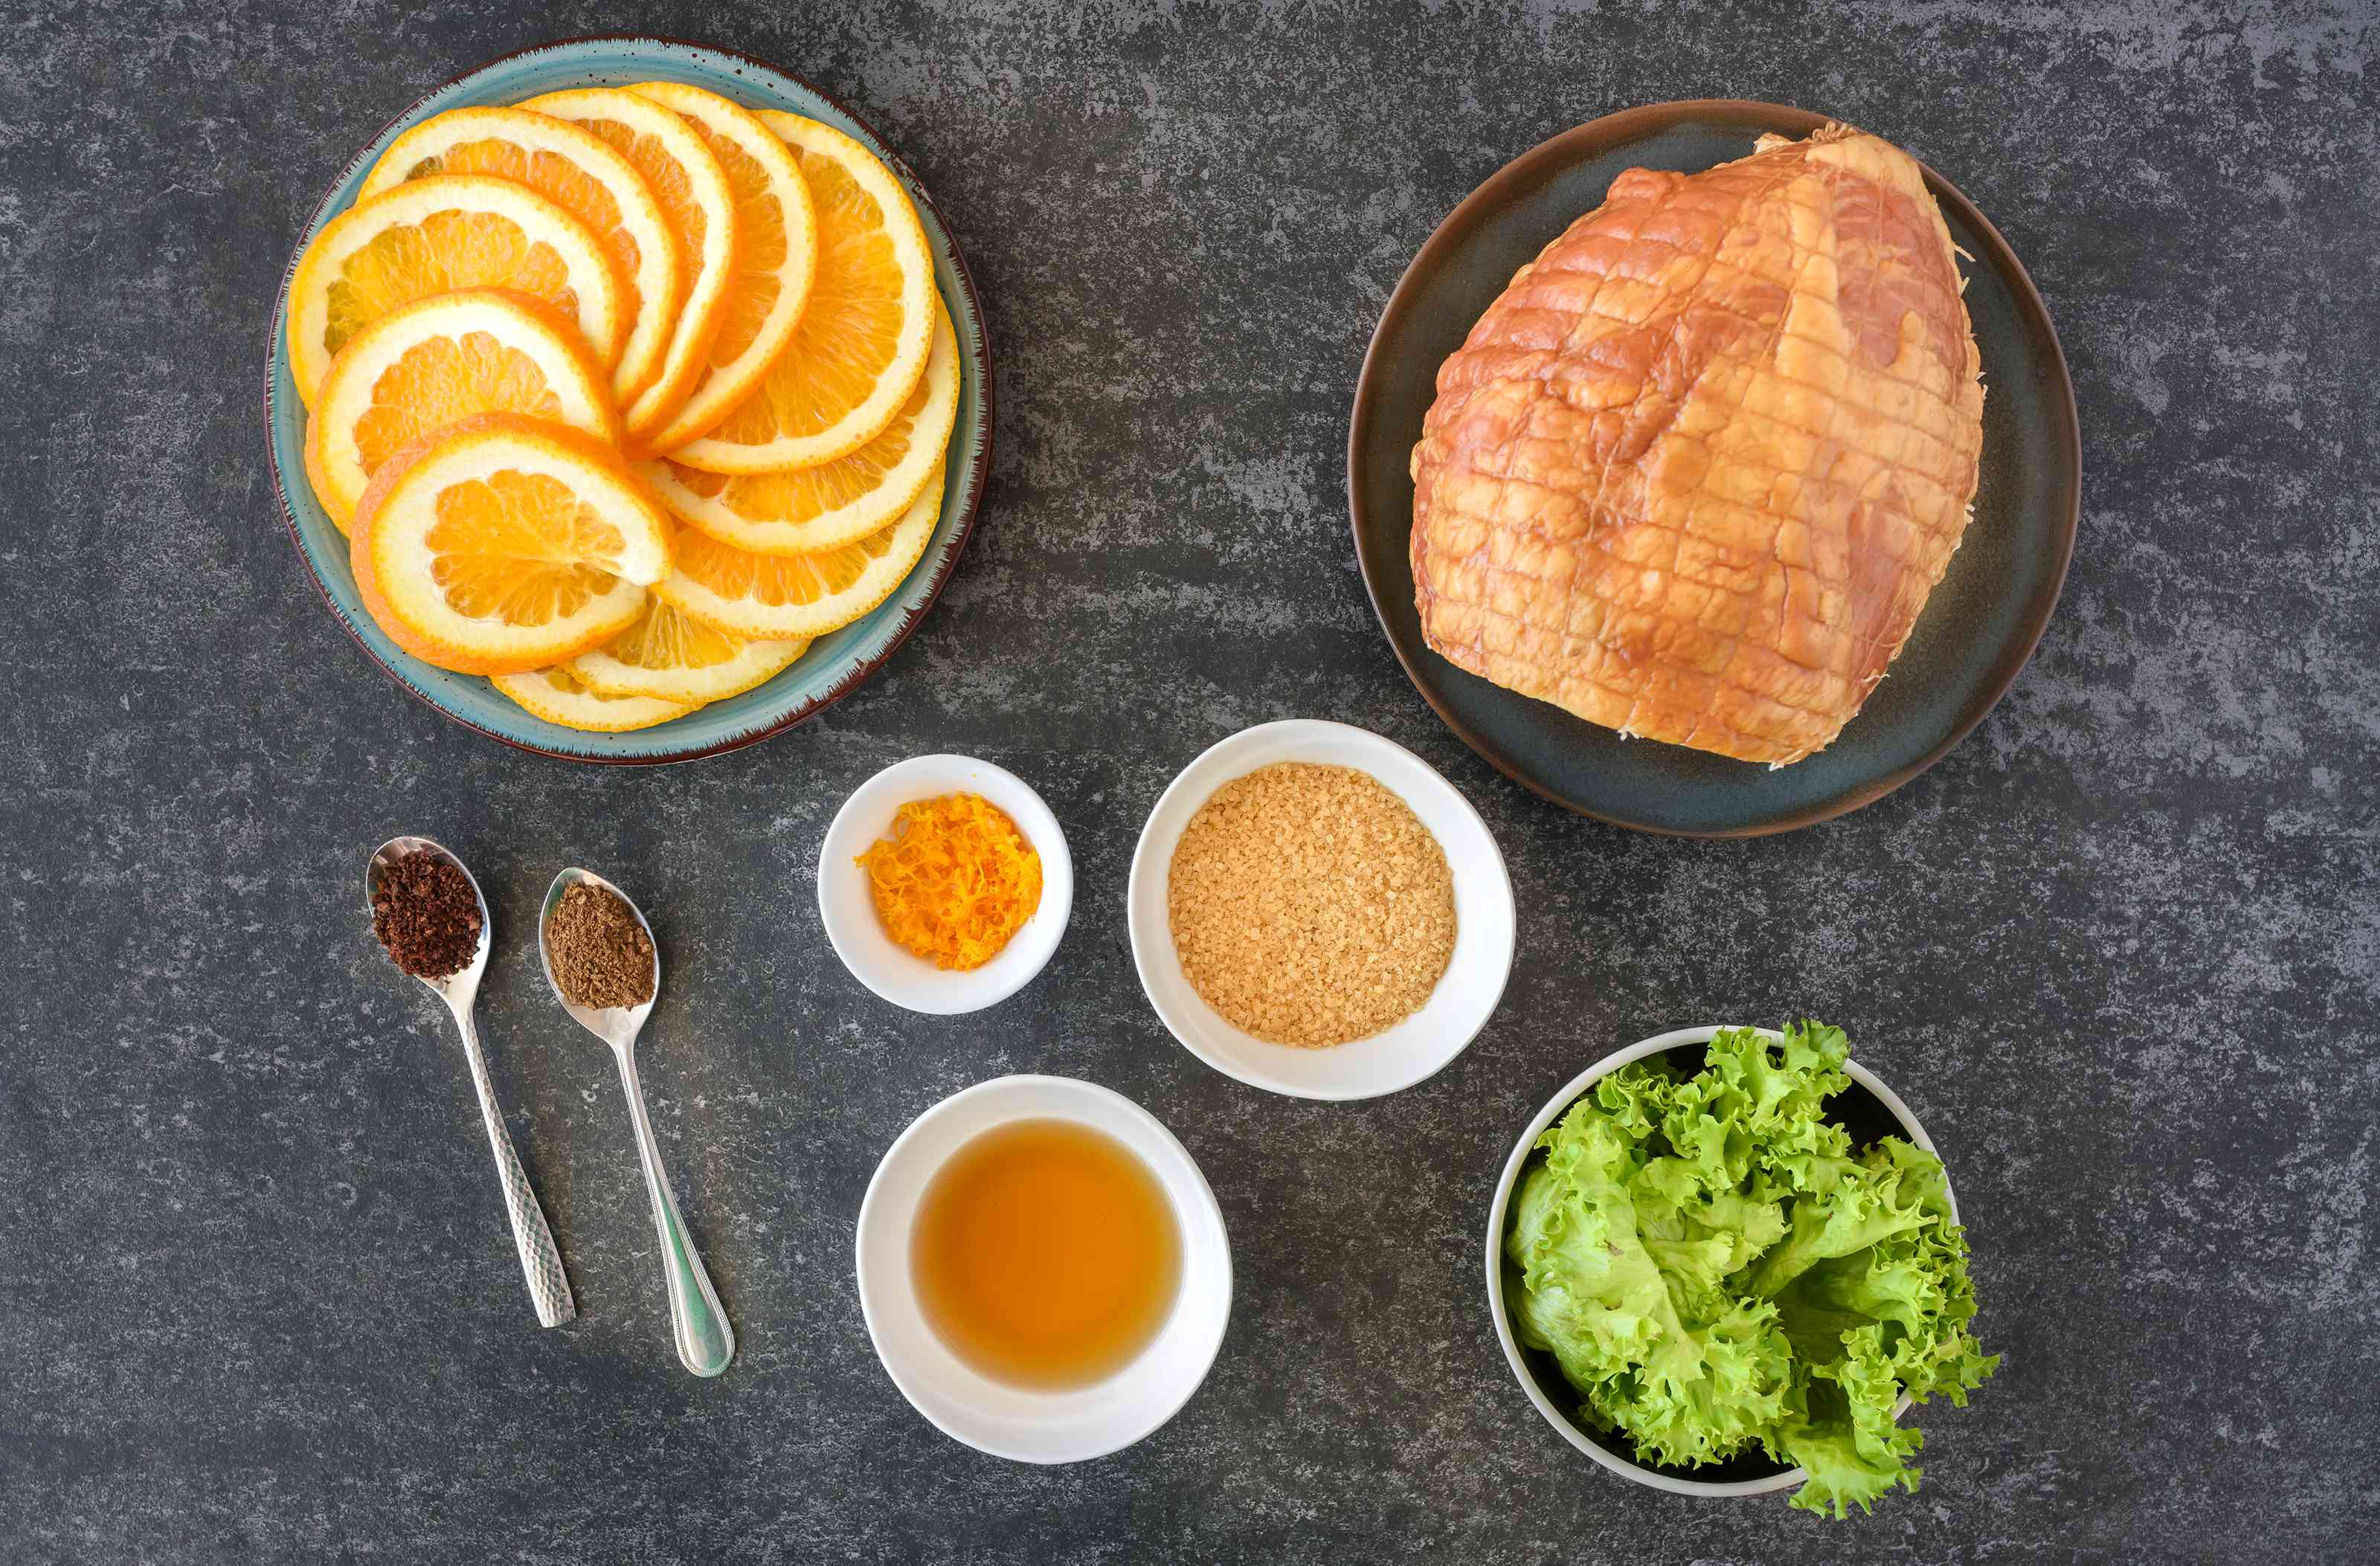 Ingredients for Jack Daniels glazed ham